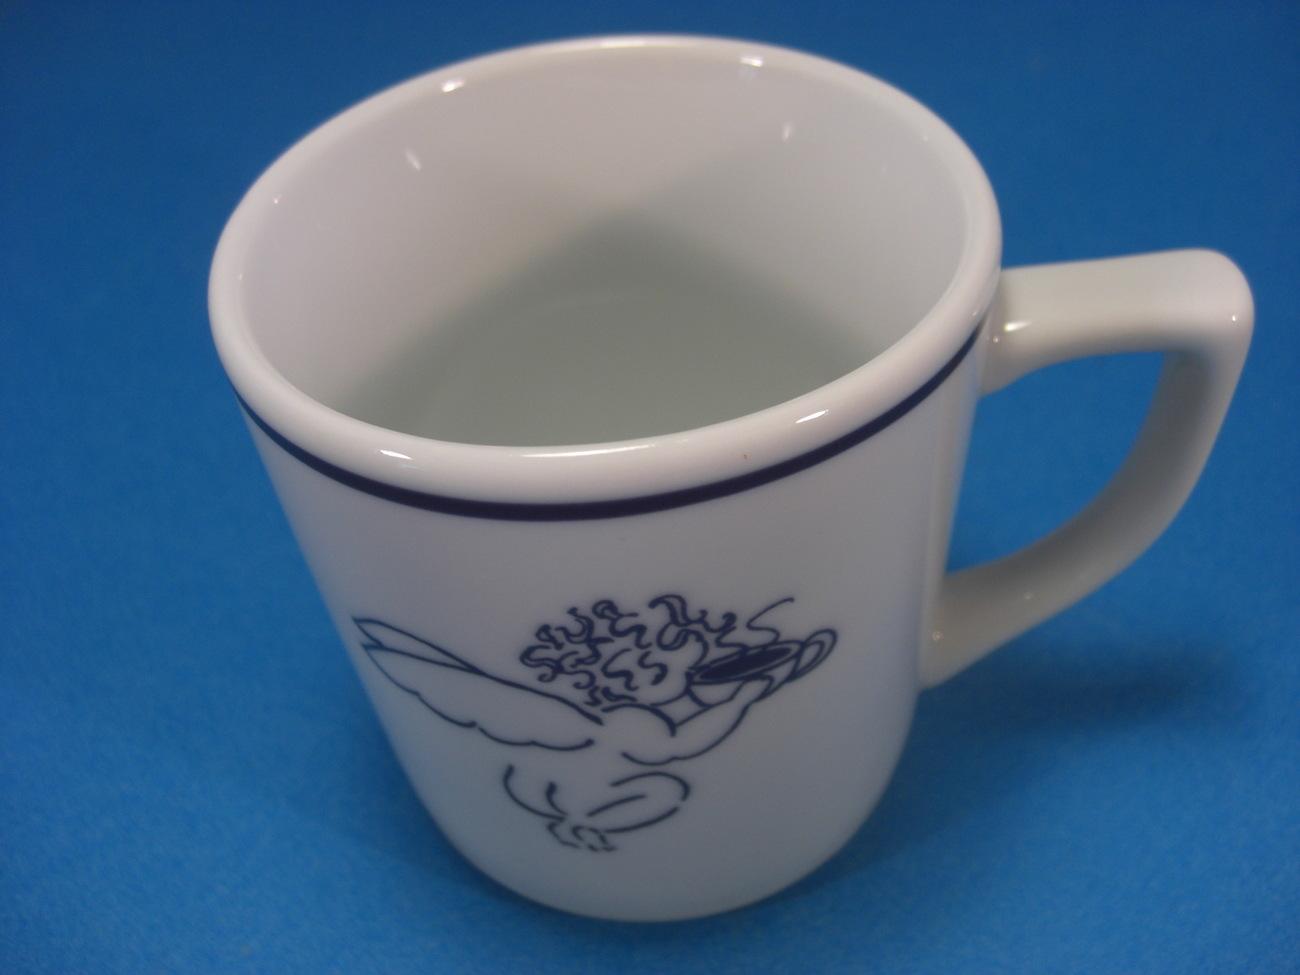 Starbucks Blue Angel Cherub by Rosanna Imports 1994